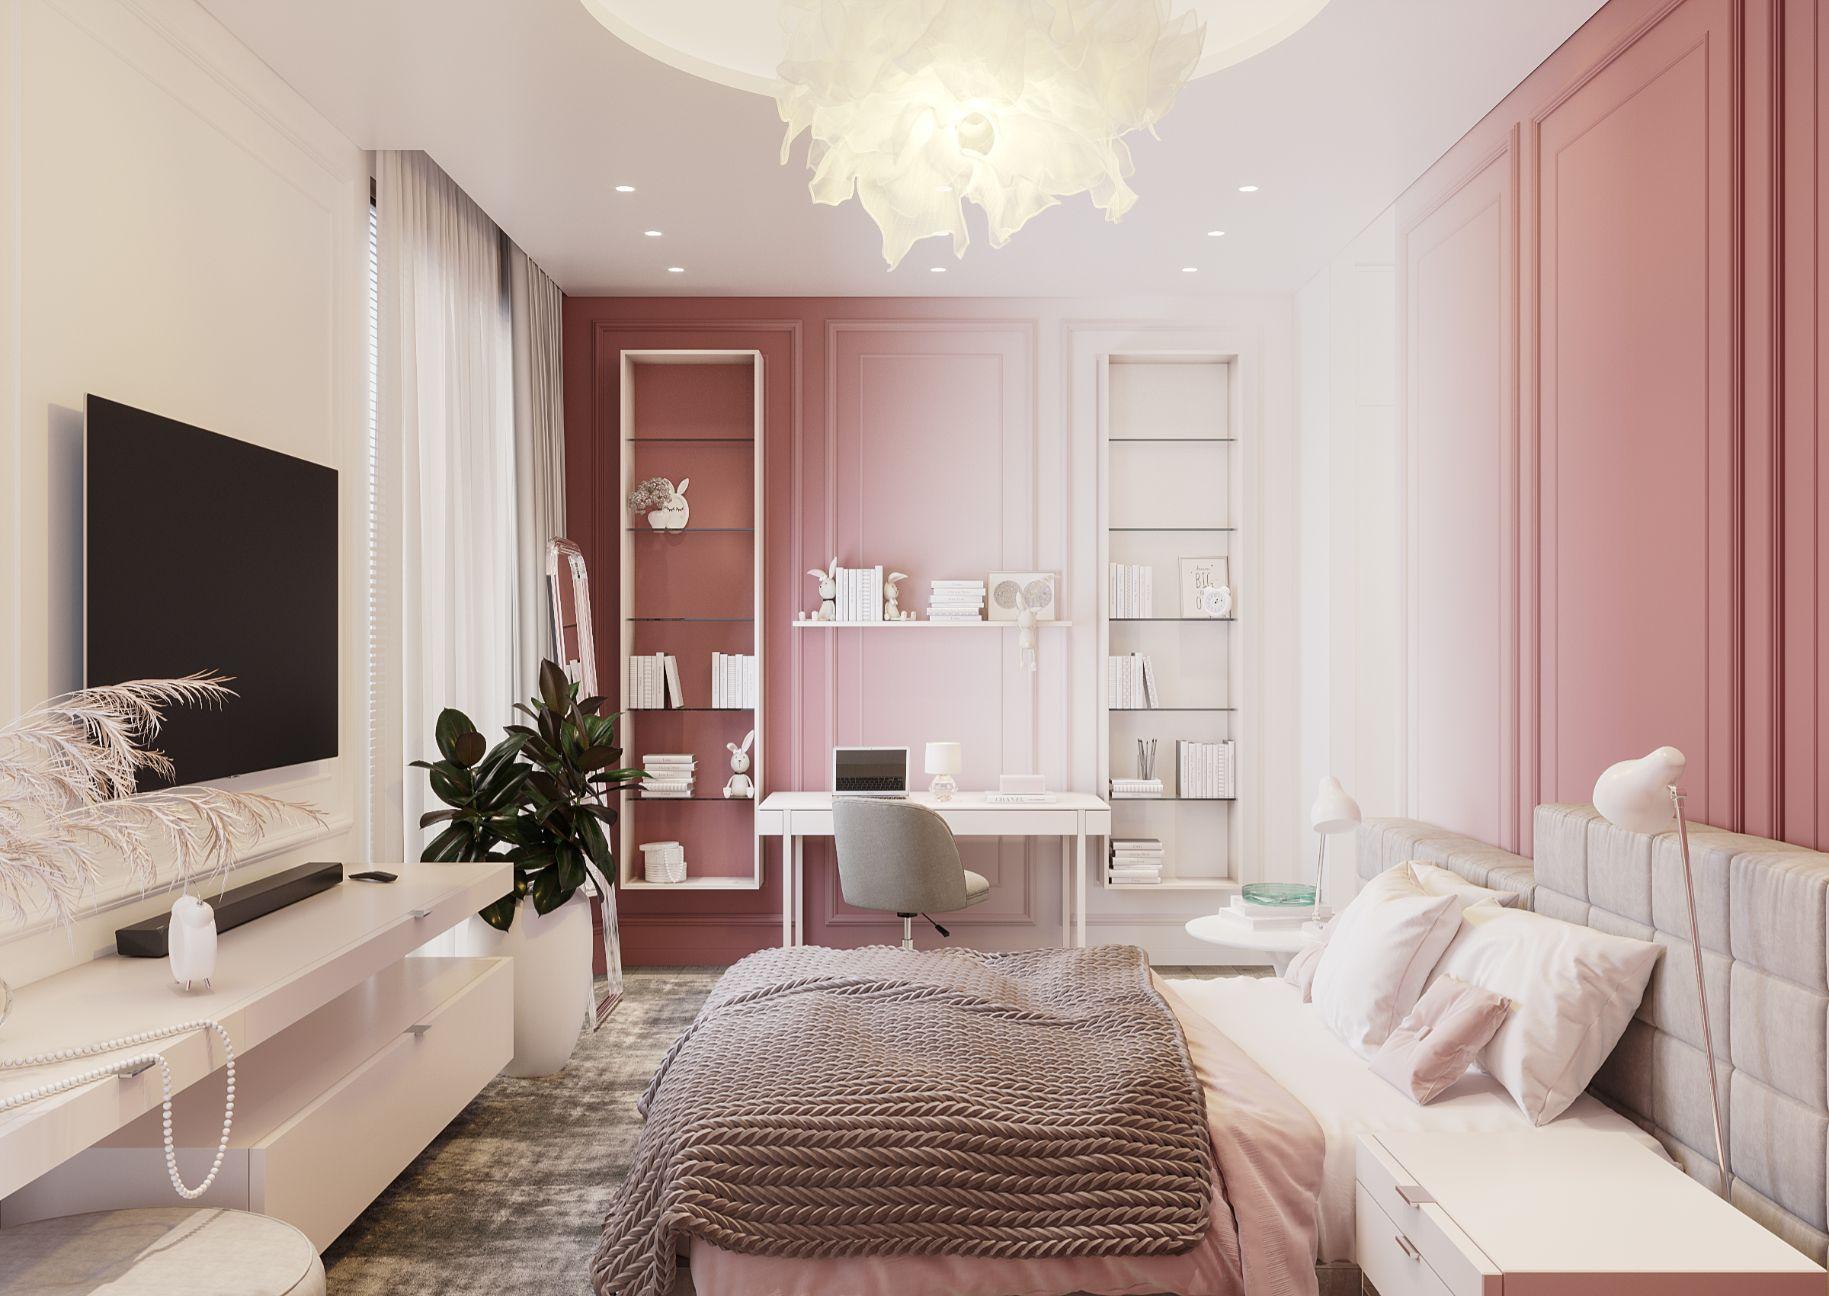 dormitor amenajare minimalista